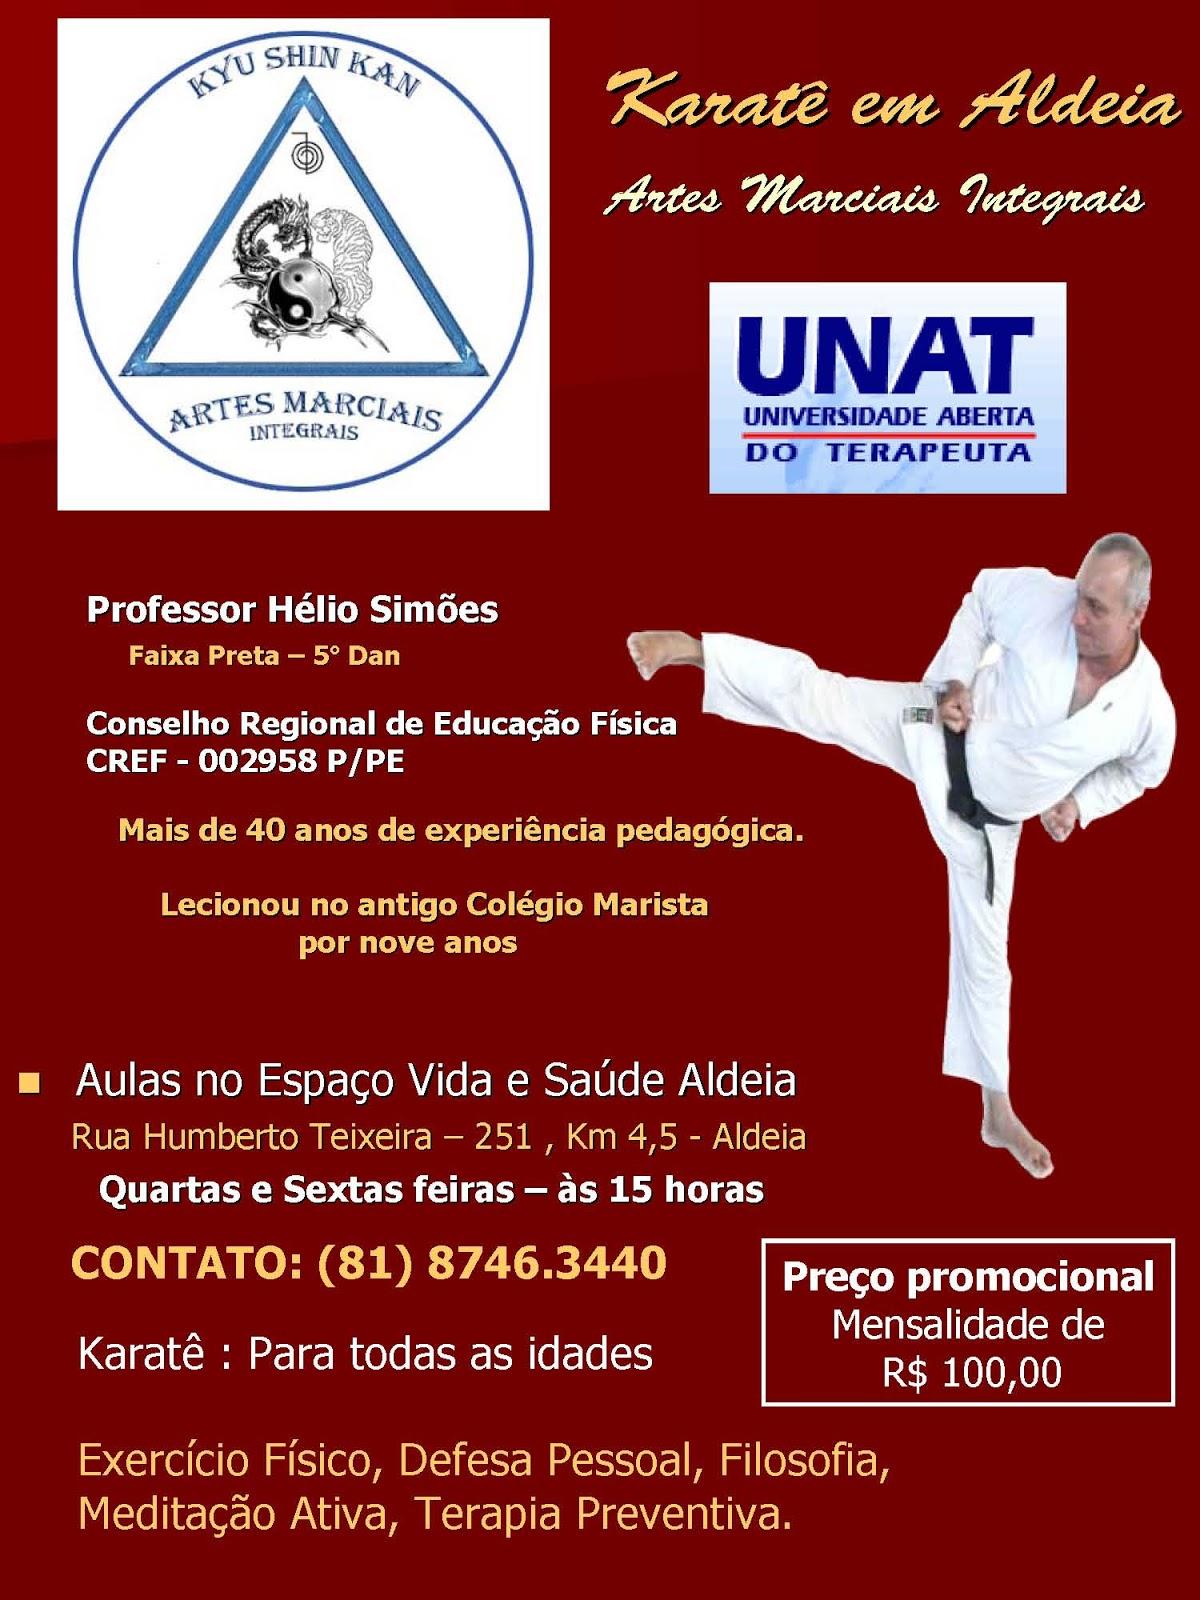 Aulas de Karatê Shotokan ministradas pelo professor Hélio Simões na UNAT, Aldeia, Pernambuco. Contato: (81) 87463440